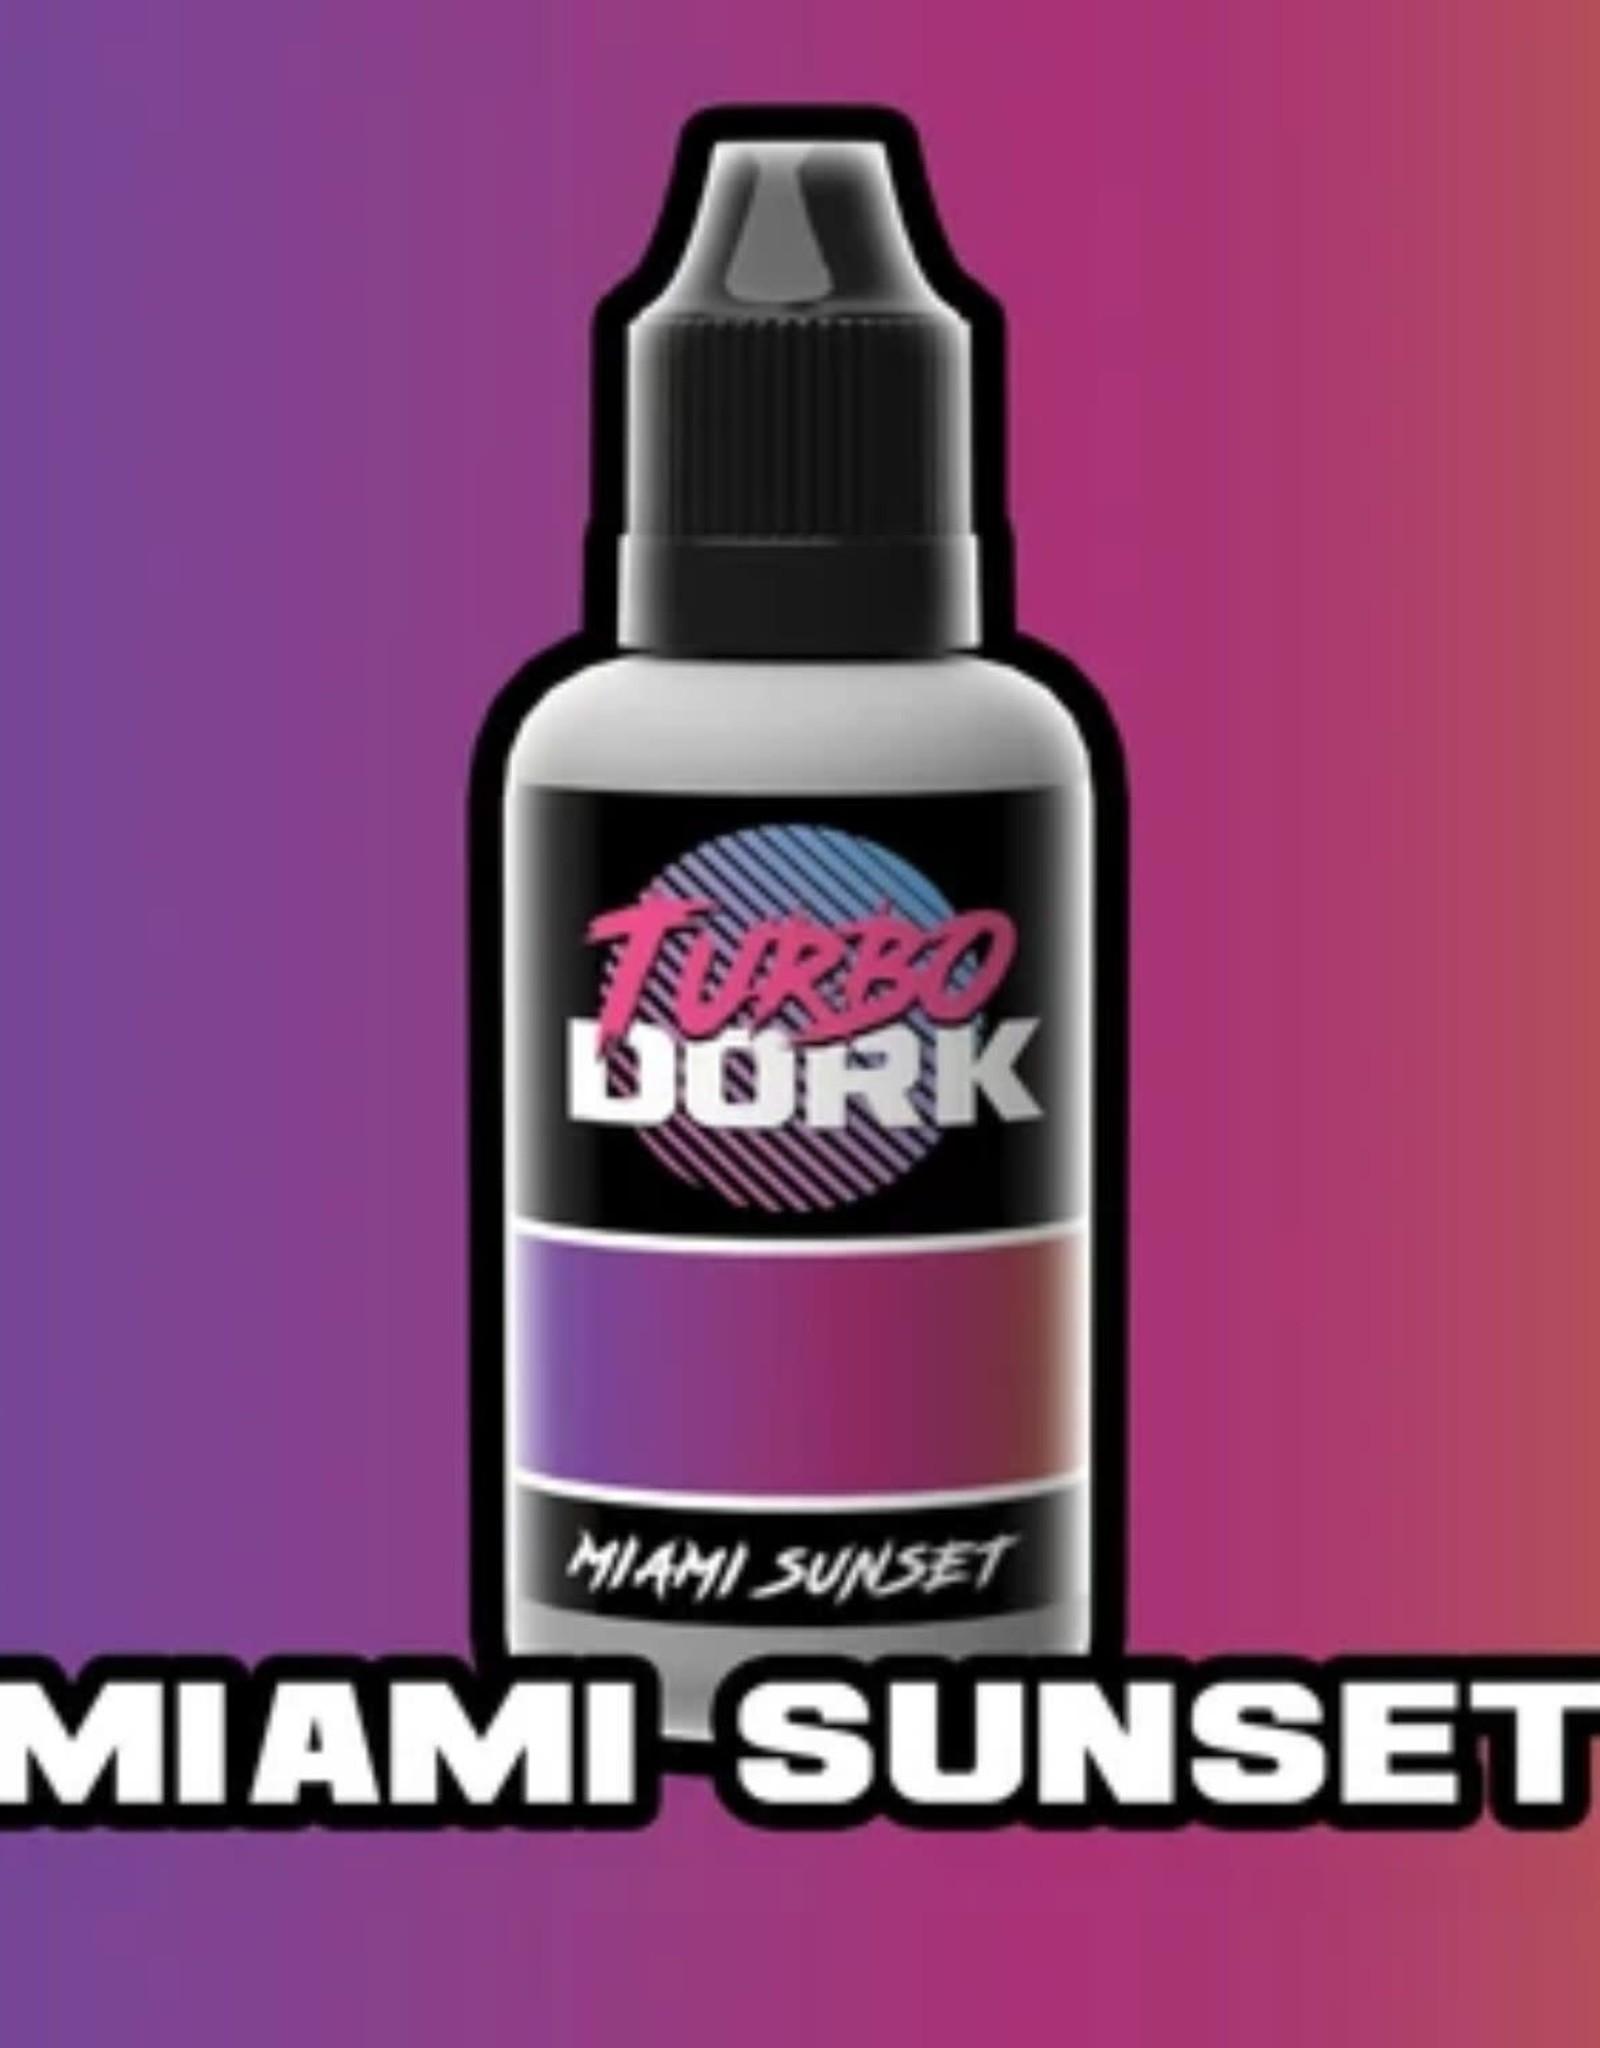 Turbo Dork Miami Sunset - Turboshift